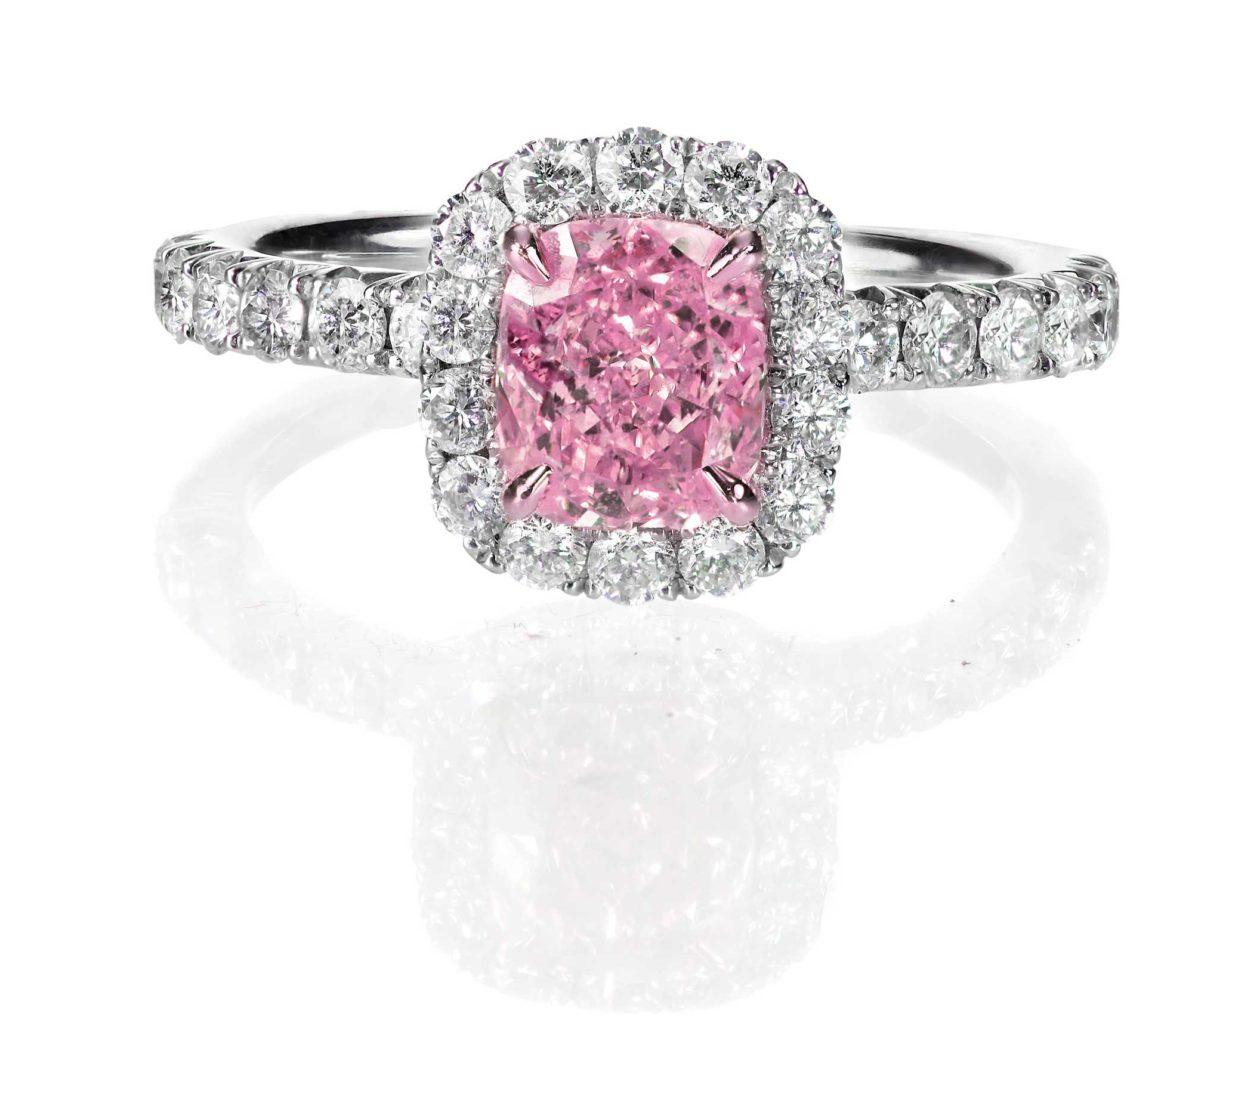 Number-4-Pink-Shutterstock-Image-386343925